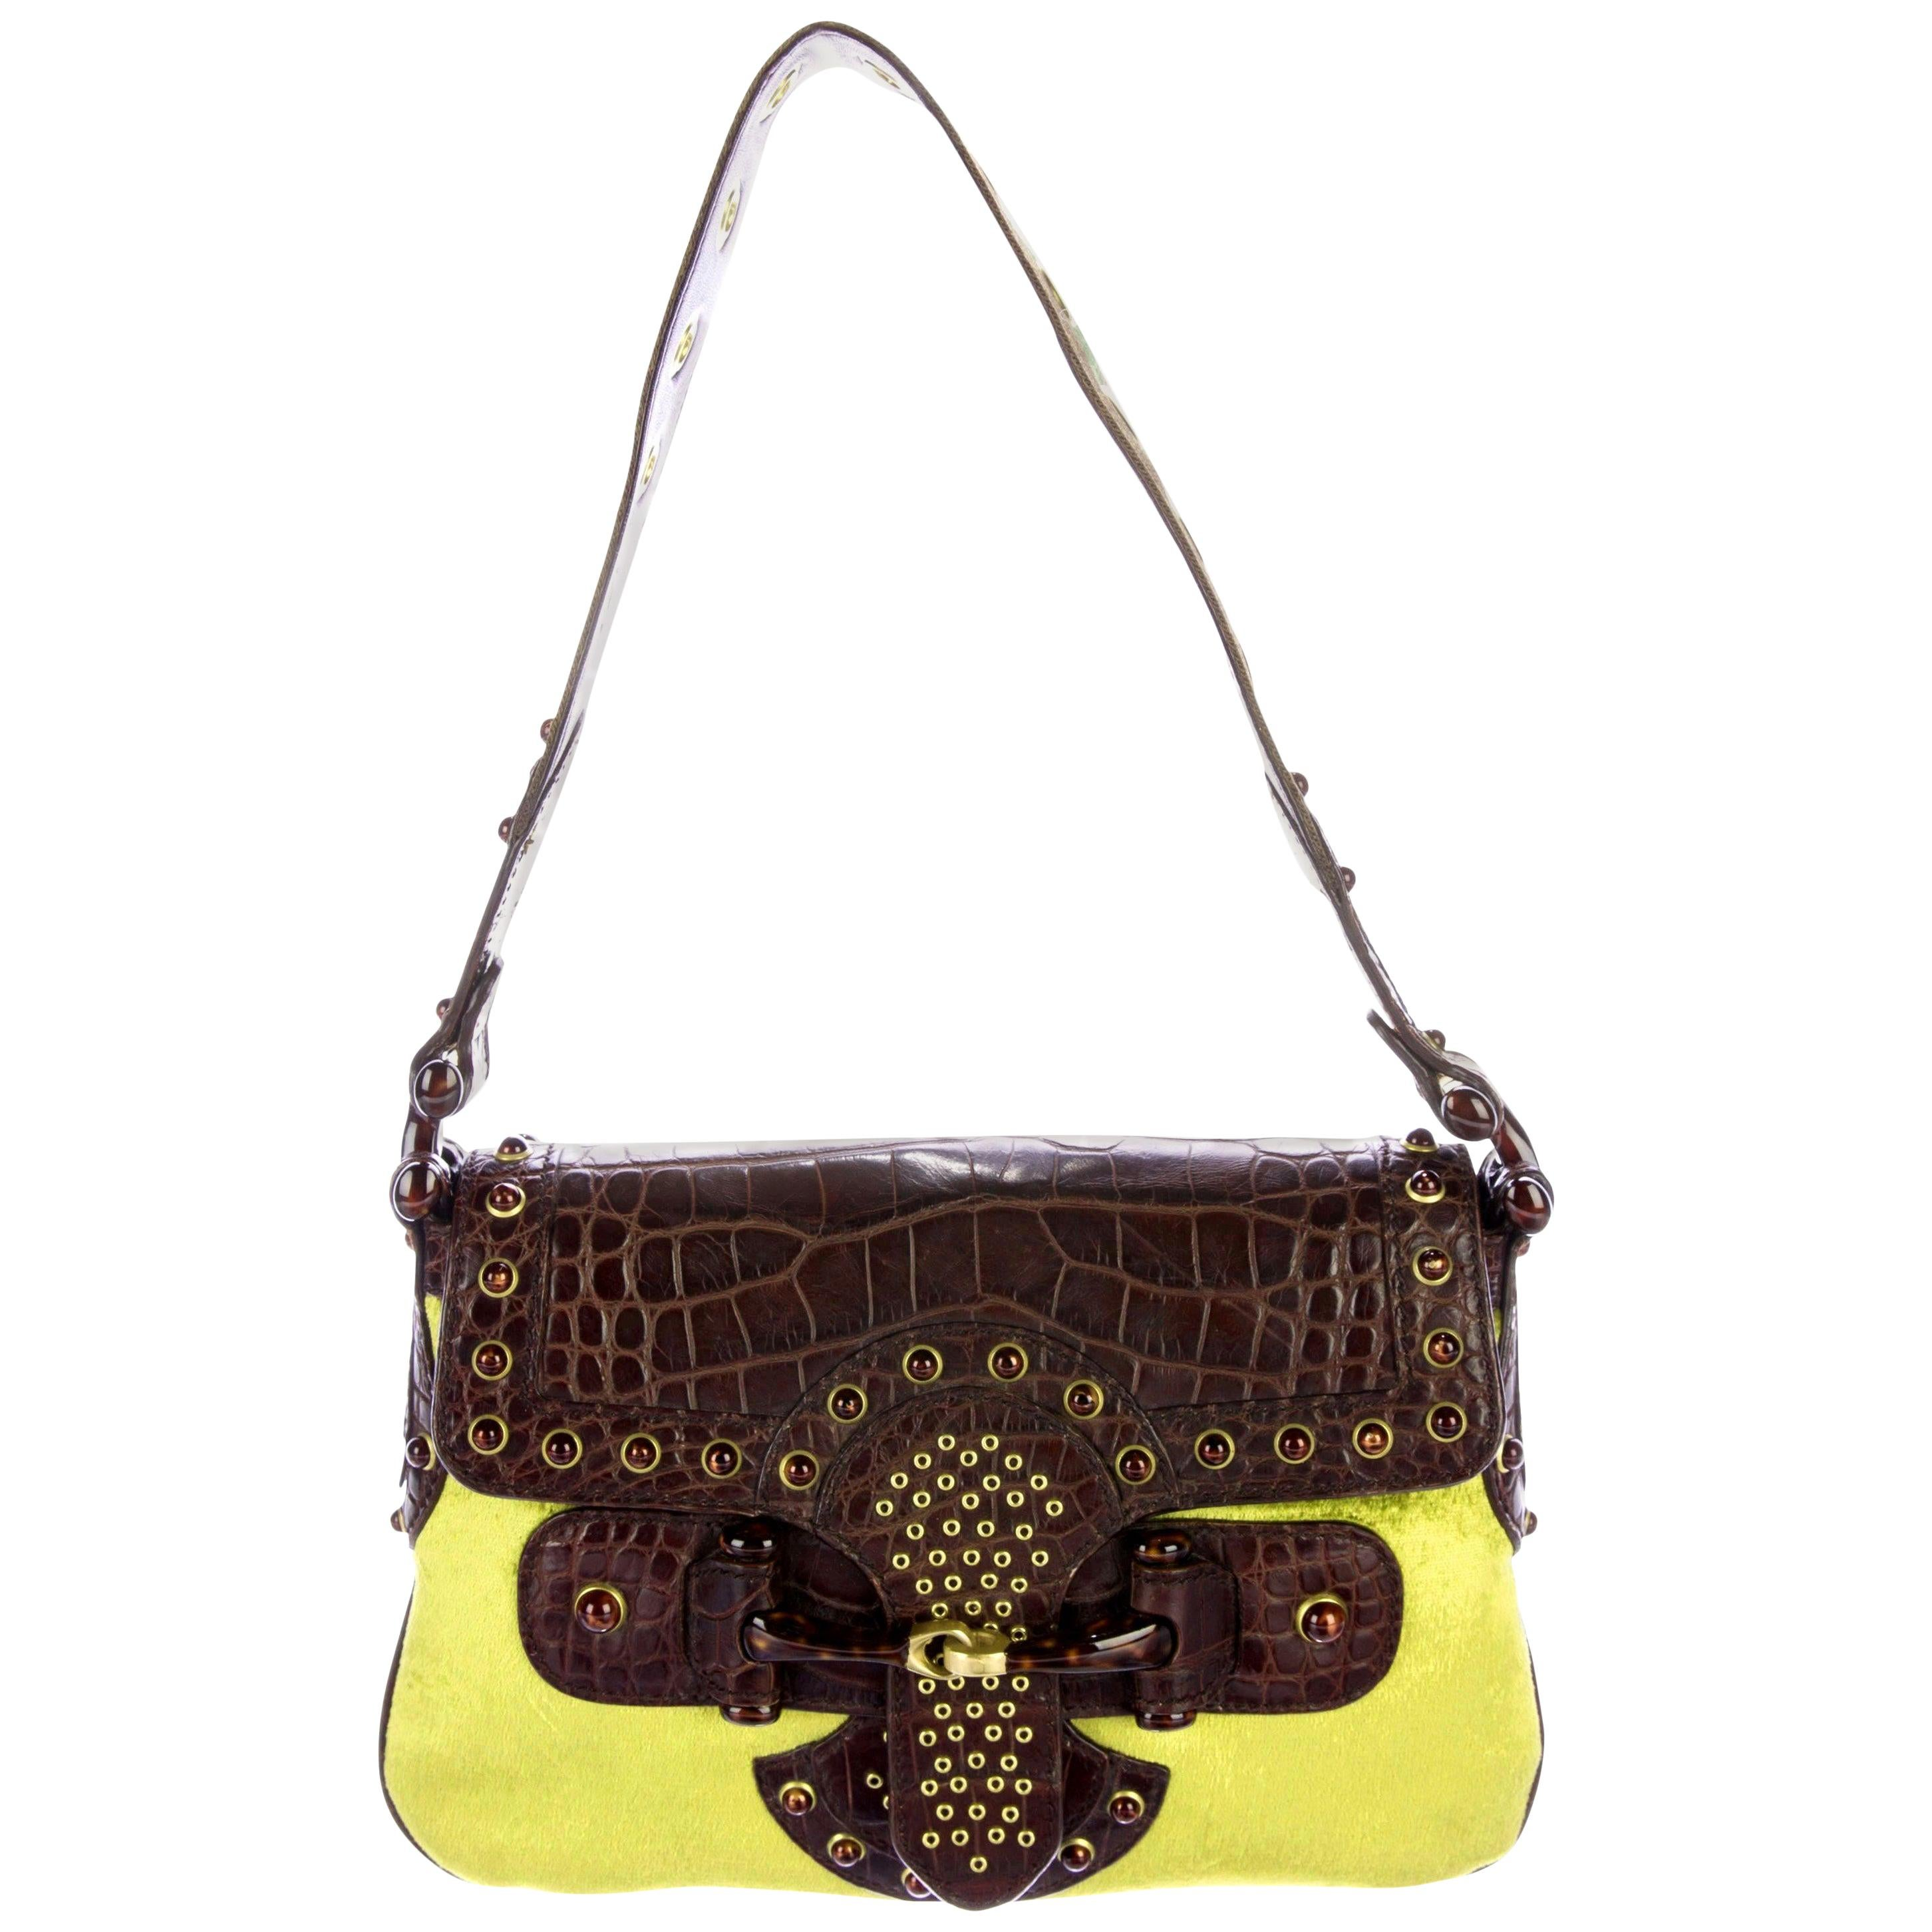 Gucci by Tom Ford Studded Crocodile and Velvet Horsebit Handbag Purse